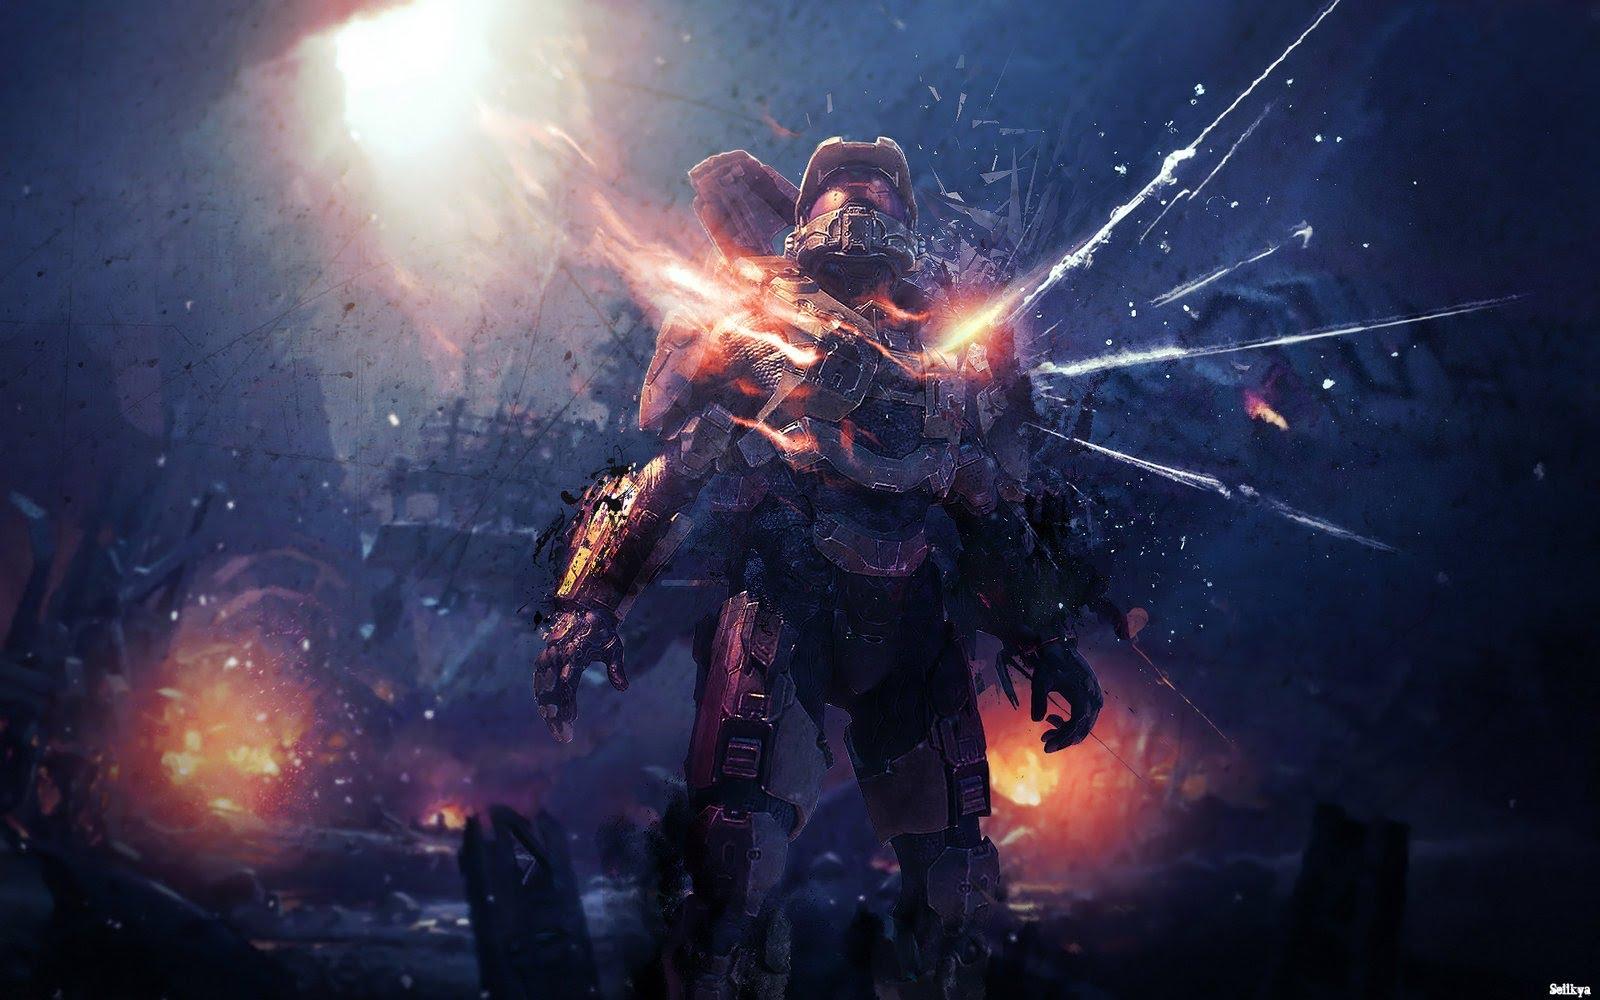 Halo 5 Reveal Teaser Trailer XBOX One Halo Annnouncement E3M13 1600x1000